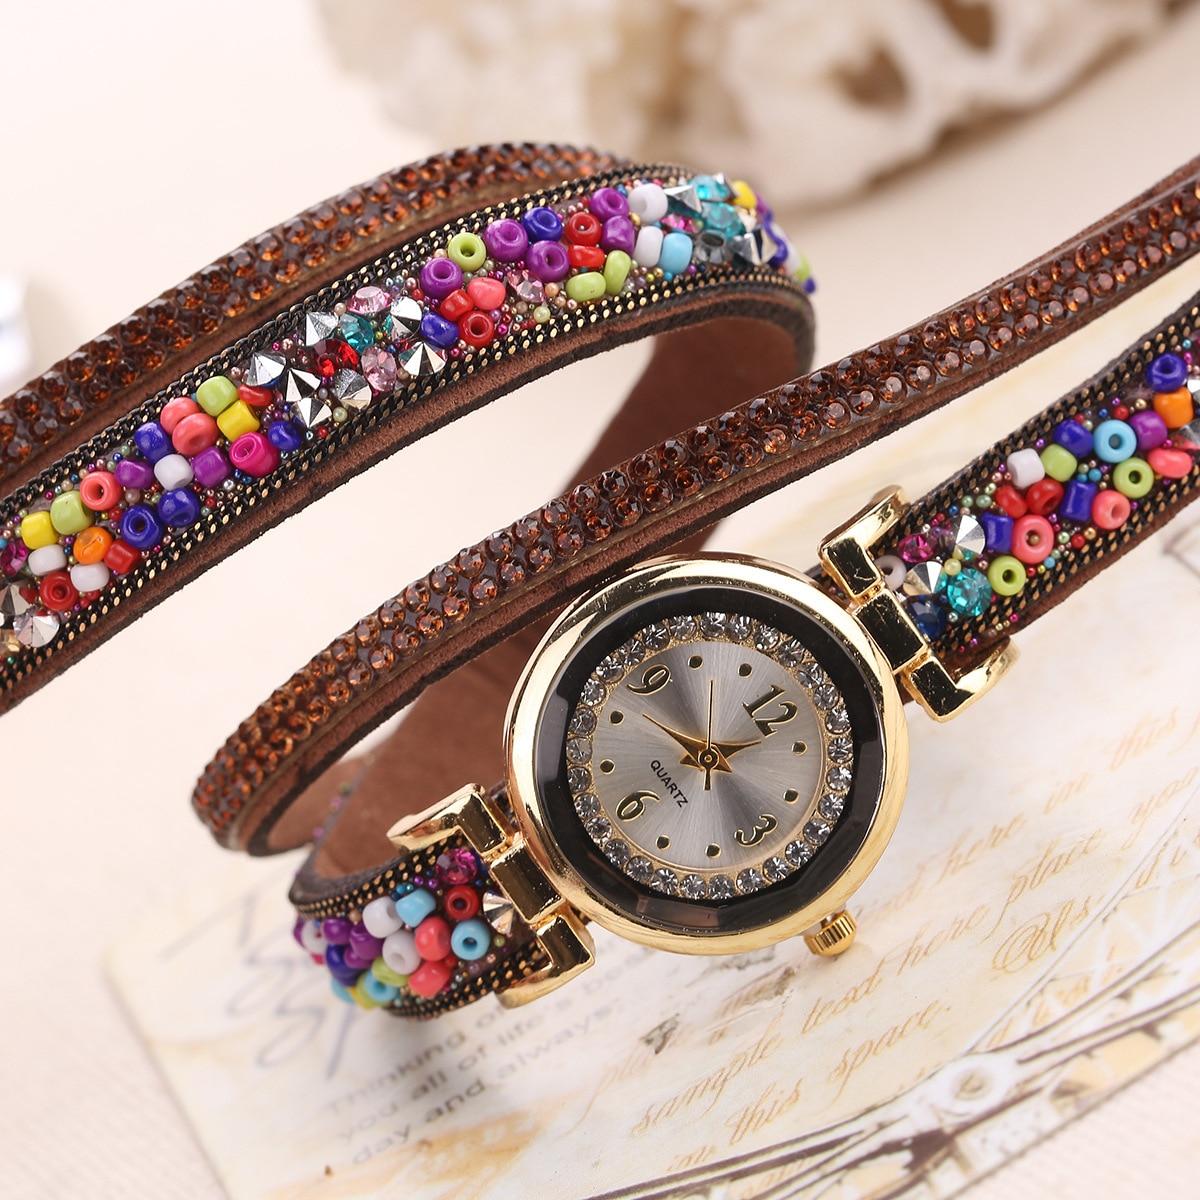 Fashion Luxury Leather Watch Kvinnor Classic Crystal Decor Armband - Damklockor - Foto 5